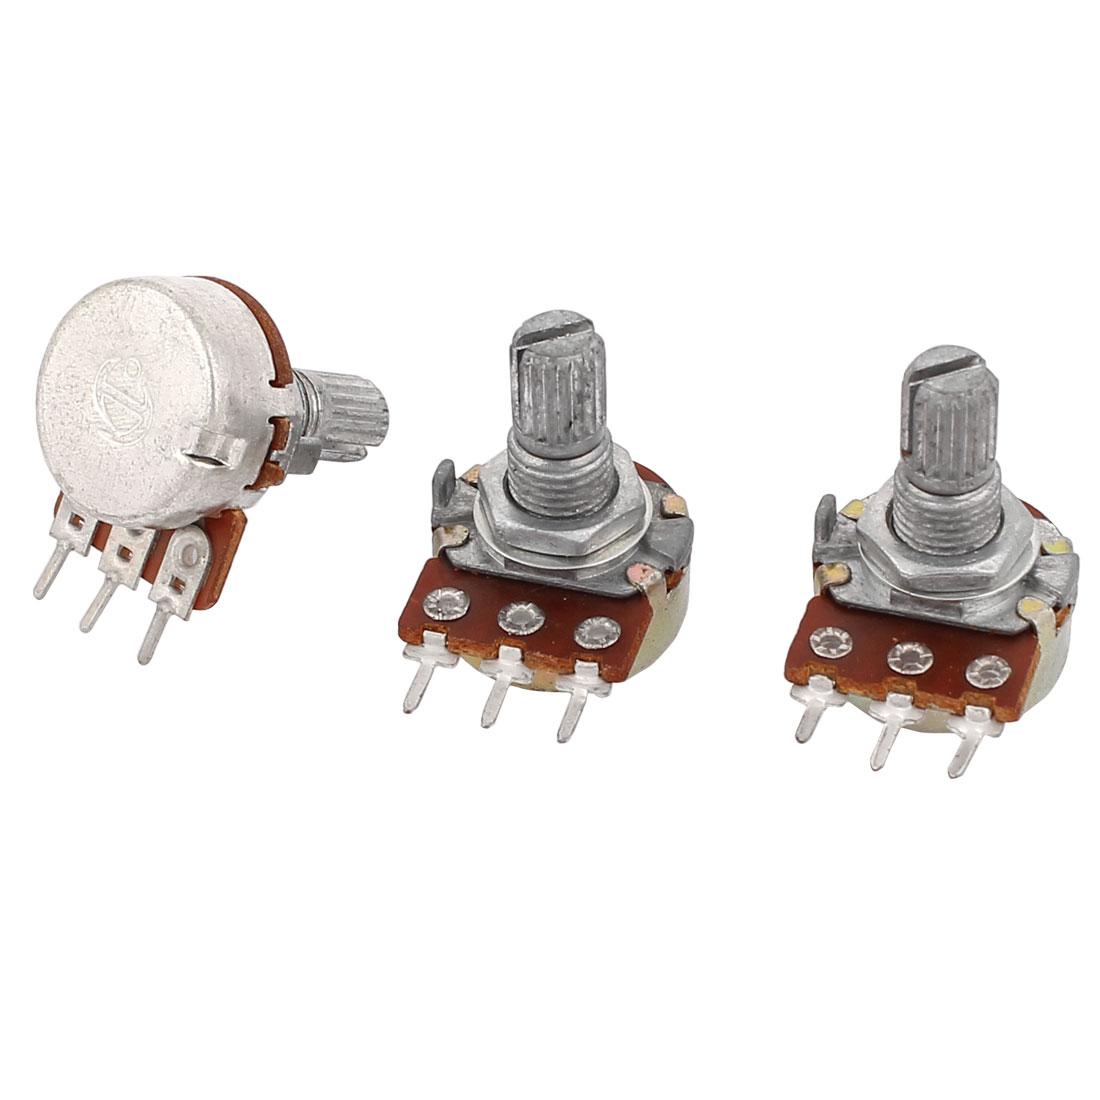 3Pcs 5K Ohm 3 Pins 6mm Dia Shaft Single Linear Rotary Potentiometers